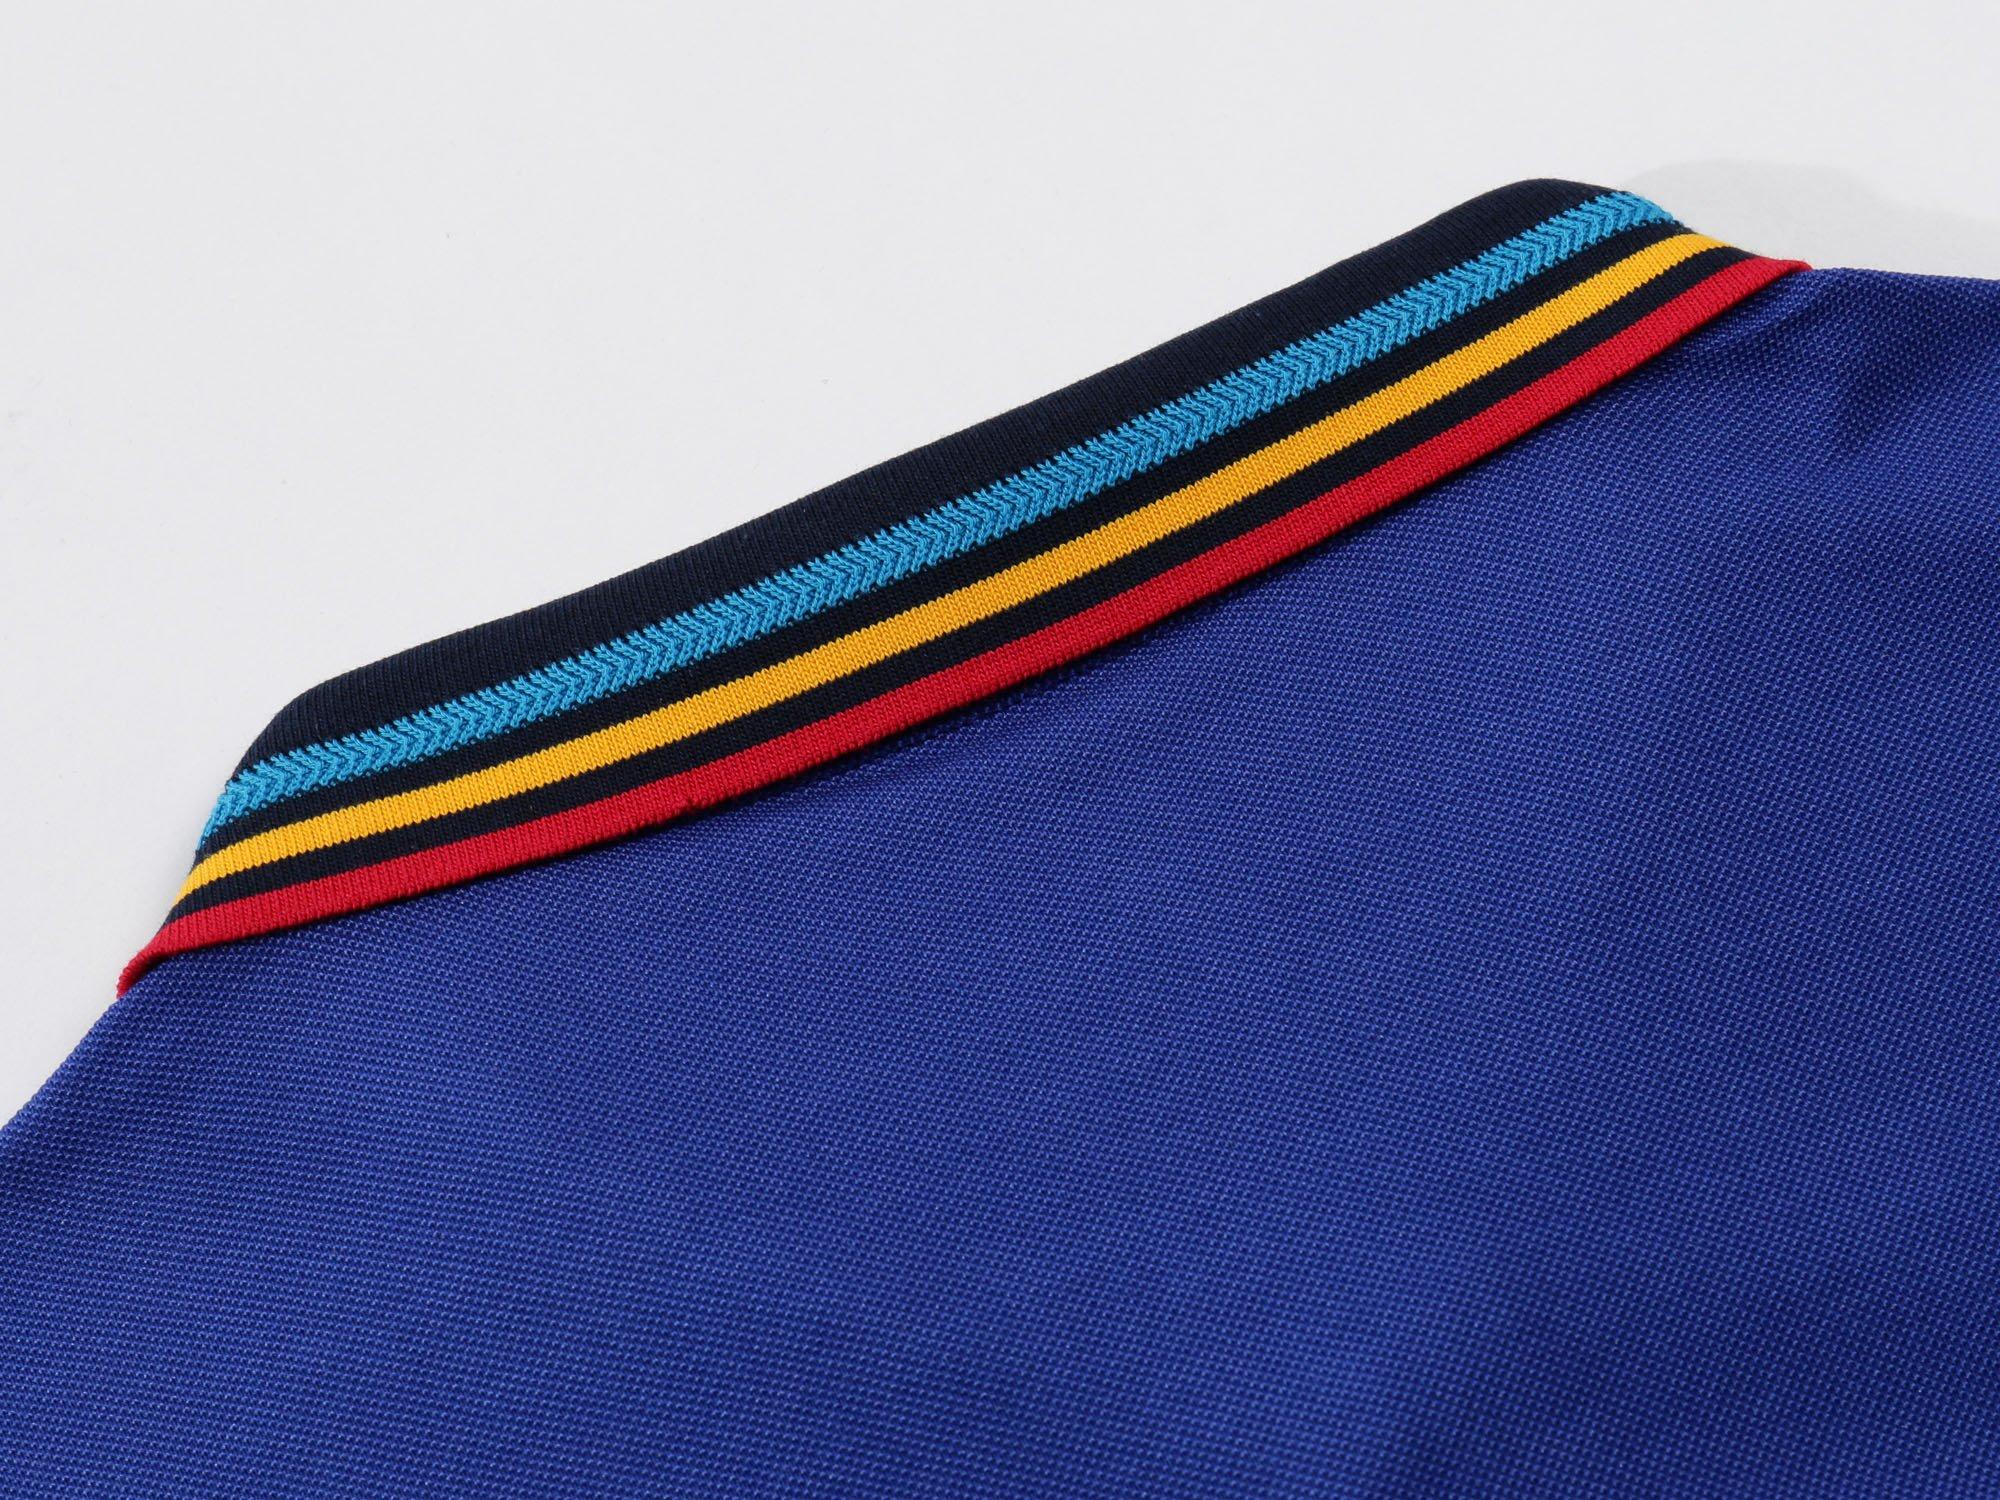 Mitario Femiego Women Classic Rainbow Collar Slim Fit Short Golf Polo Shirt Wine Red S by Mitario Femiego (Image #4)